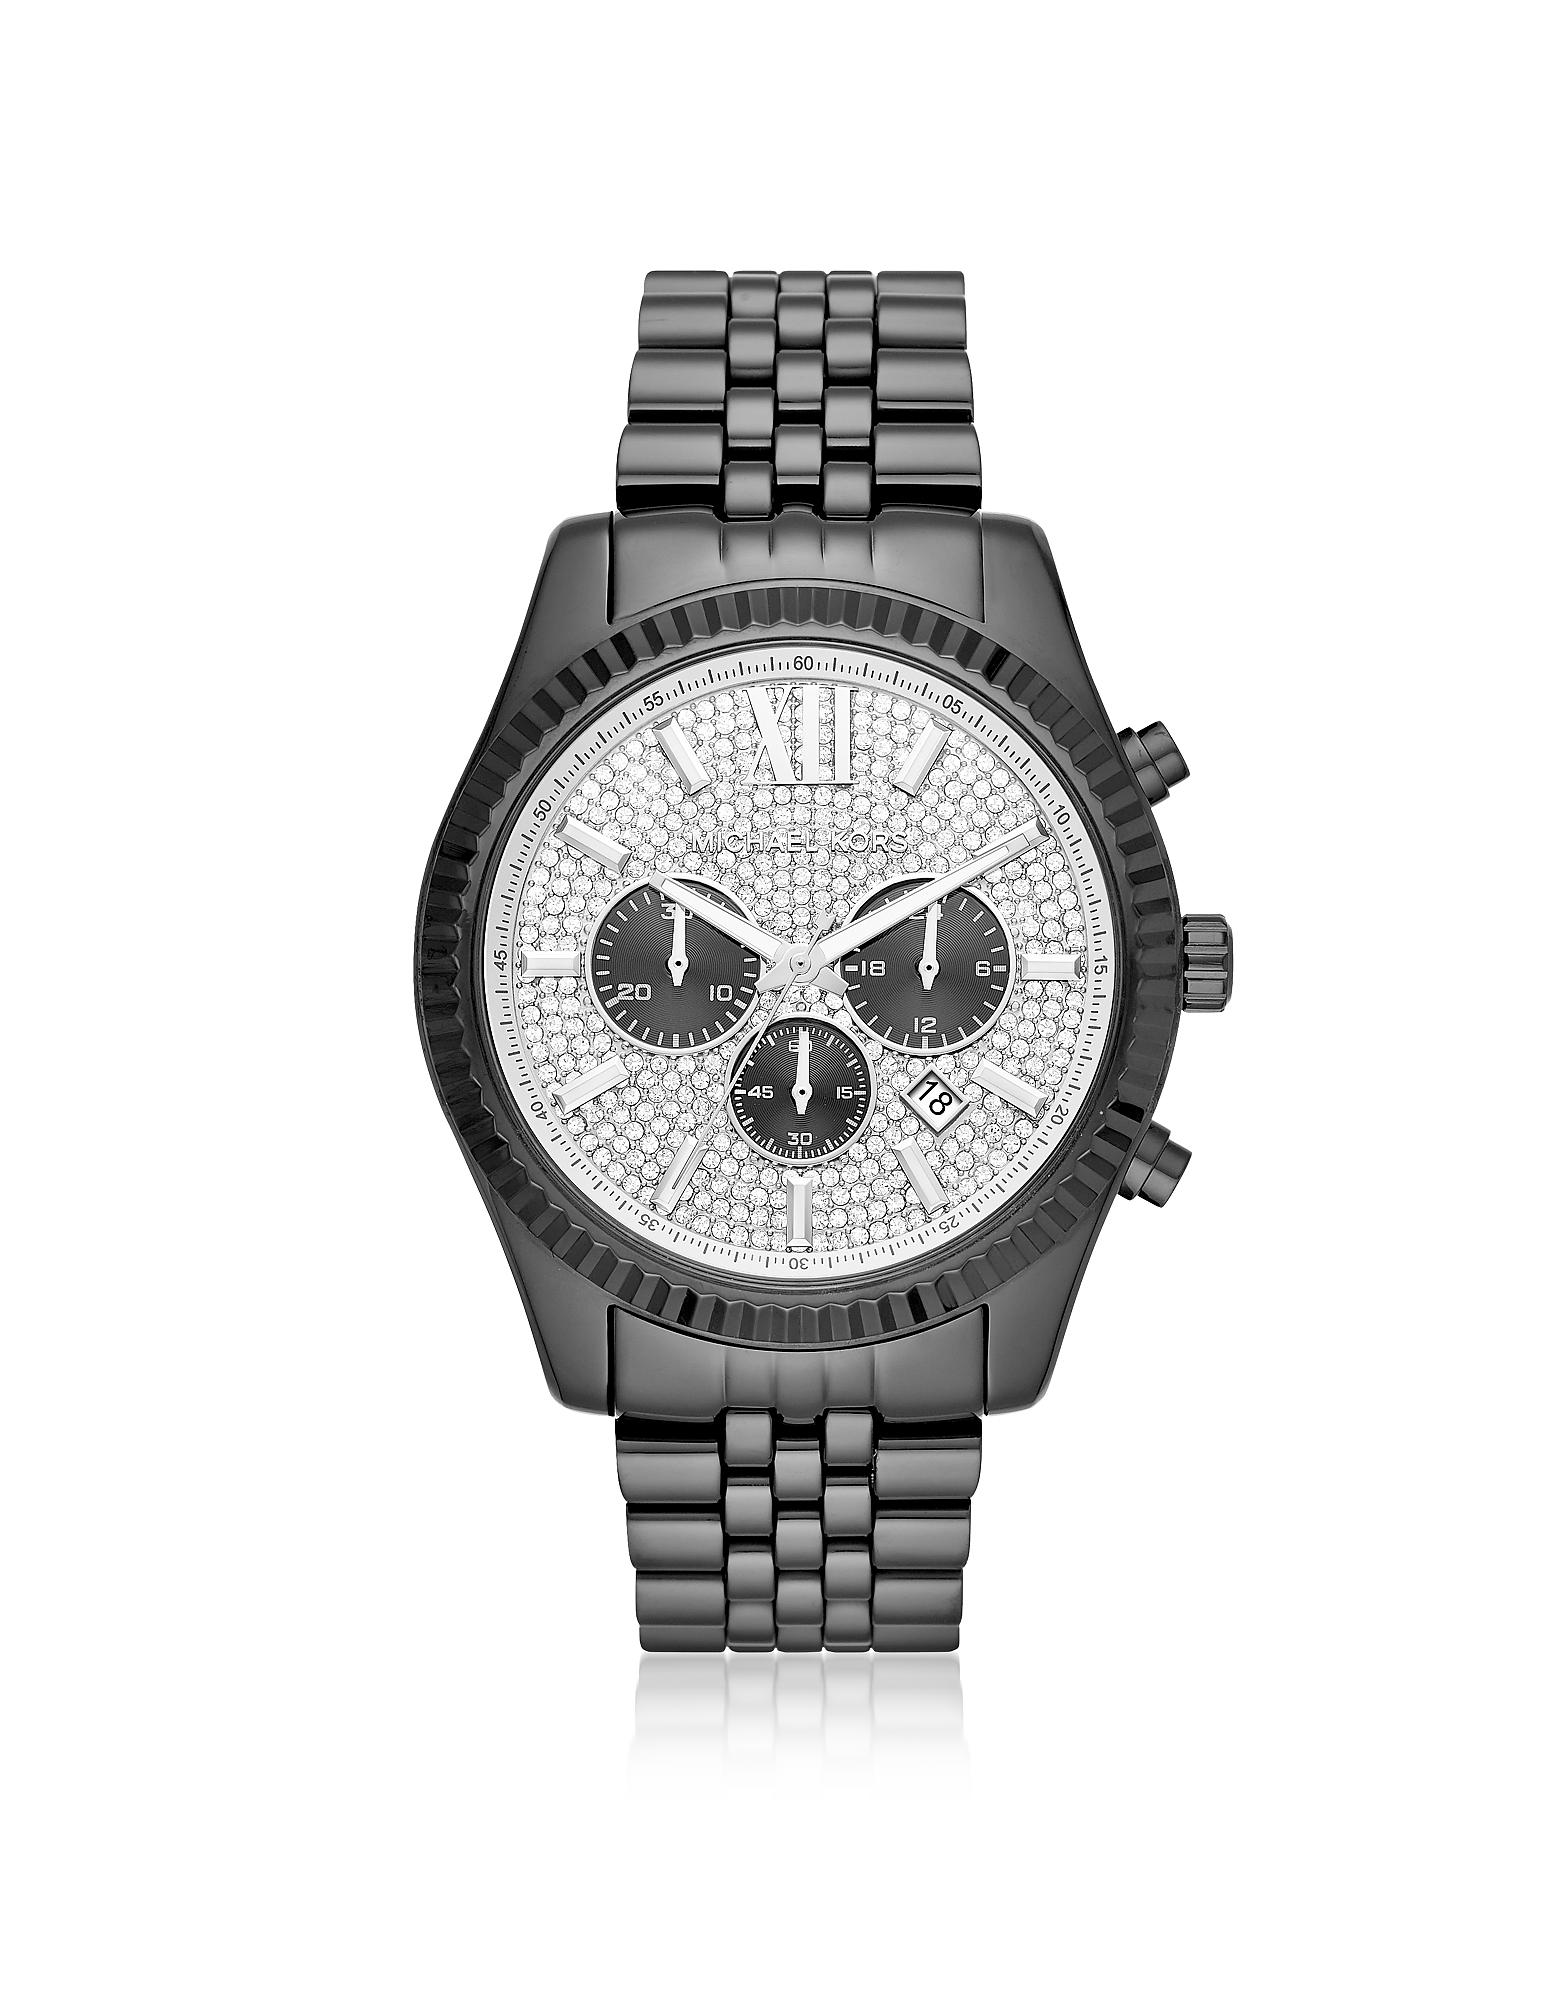 Michael Kors Men's Lexington Black IP Watch